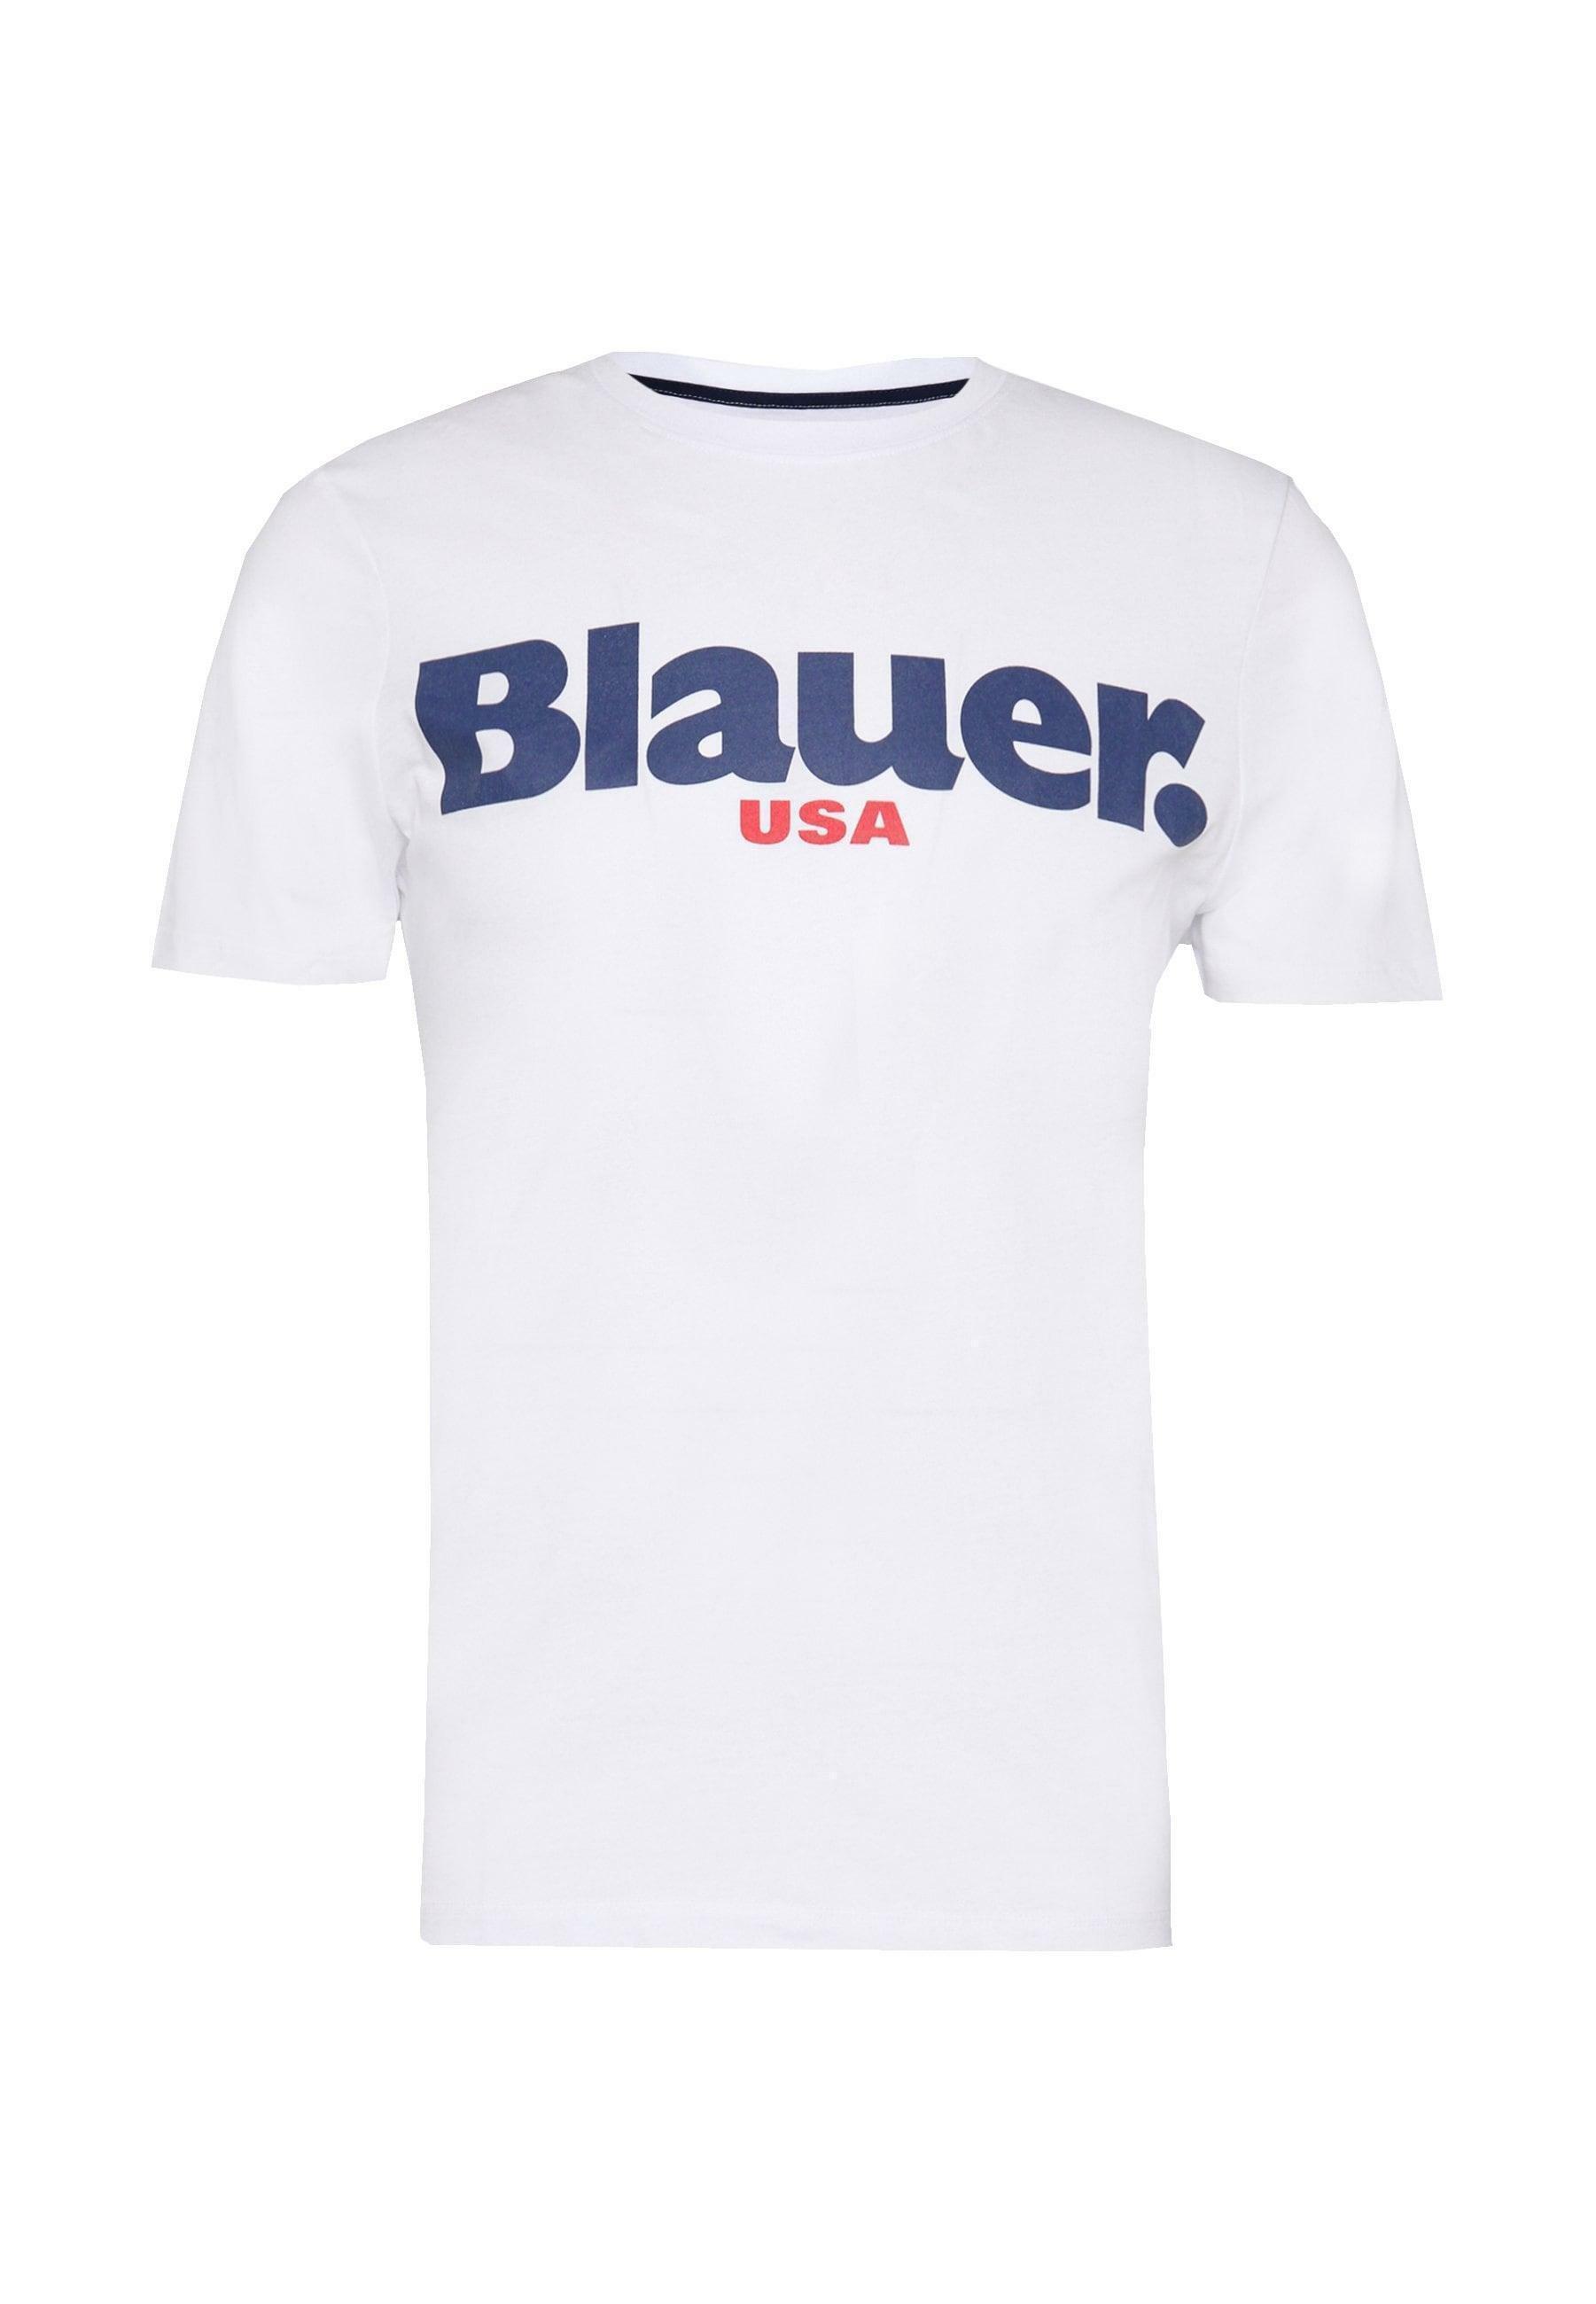 blauer t-shirt blauer uomo bianco 20sbluh02170